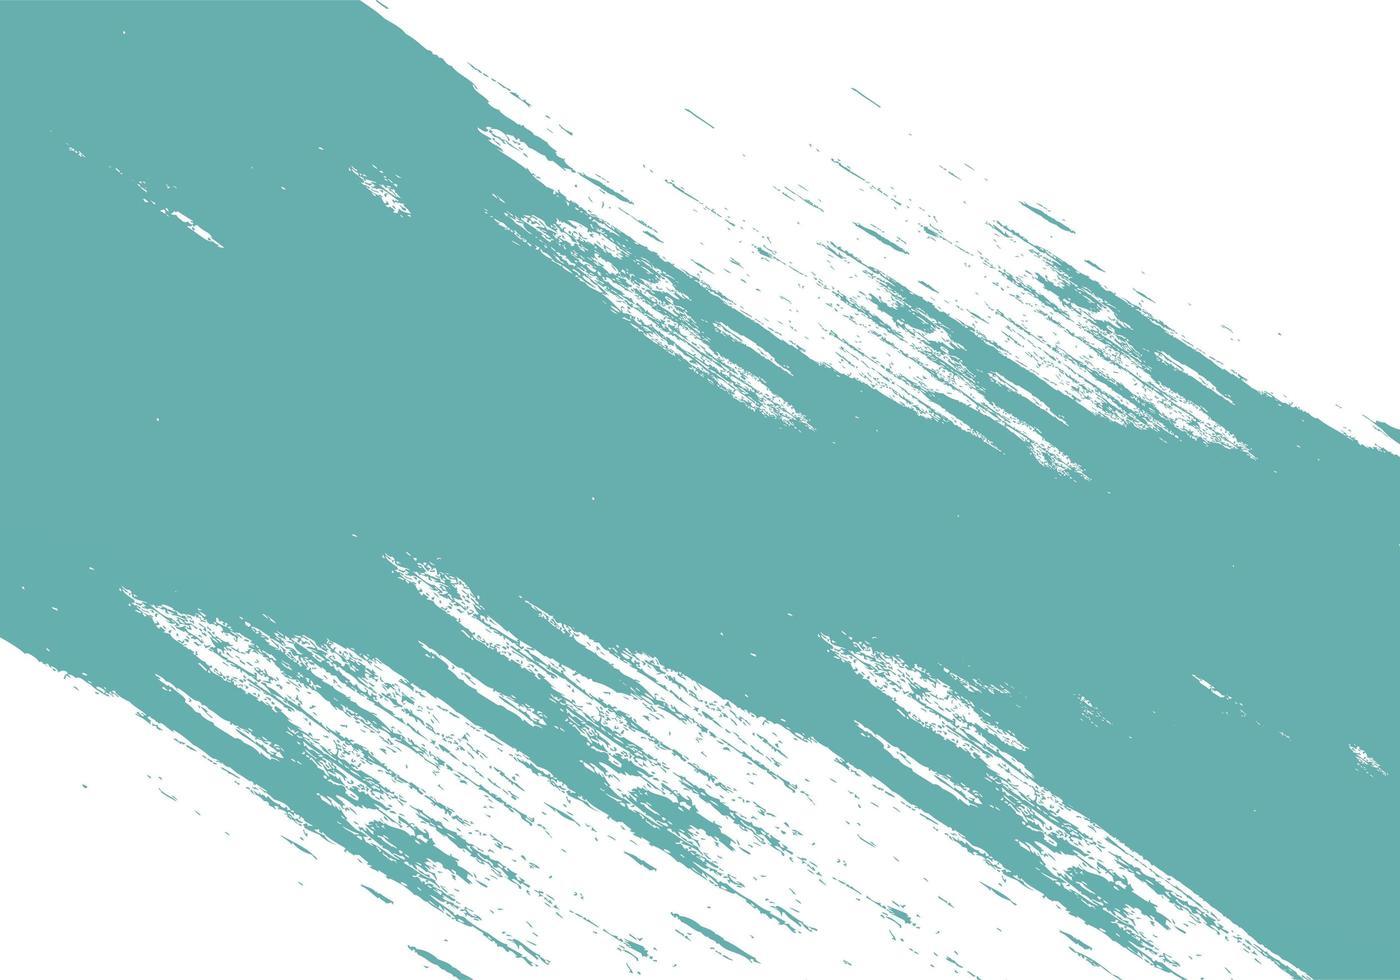 abstrakte blaugrüne Pinselstrich Textur vektor